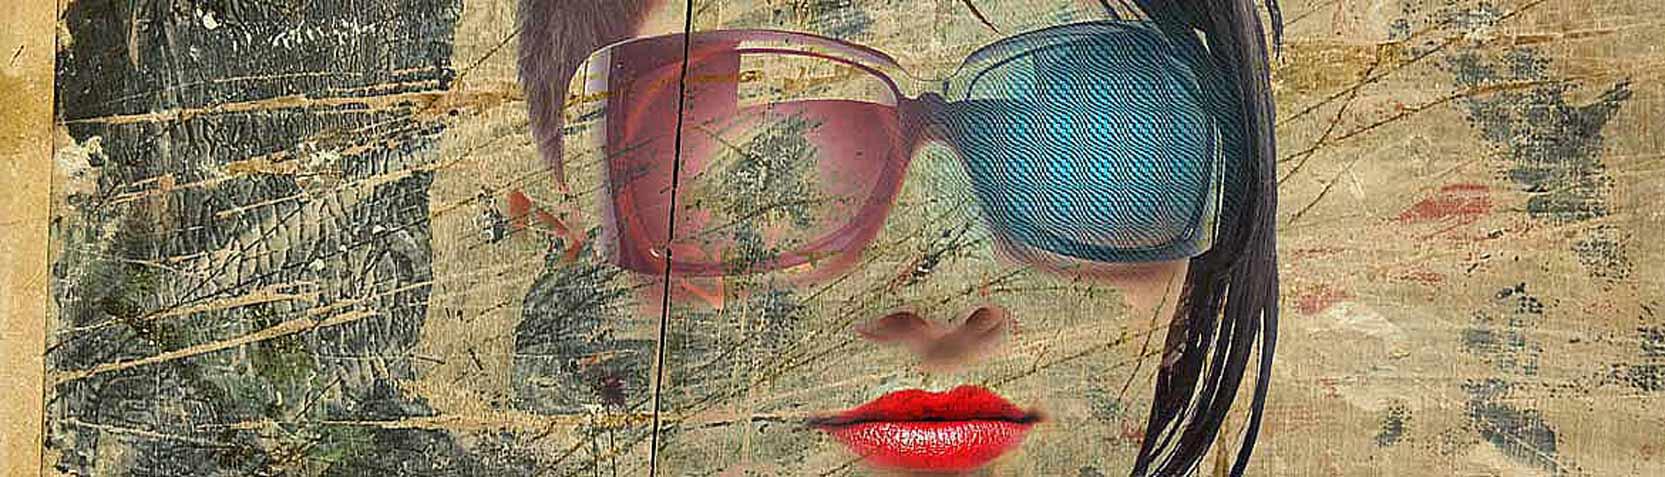 Styles - L'art contemporain